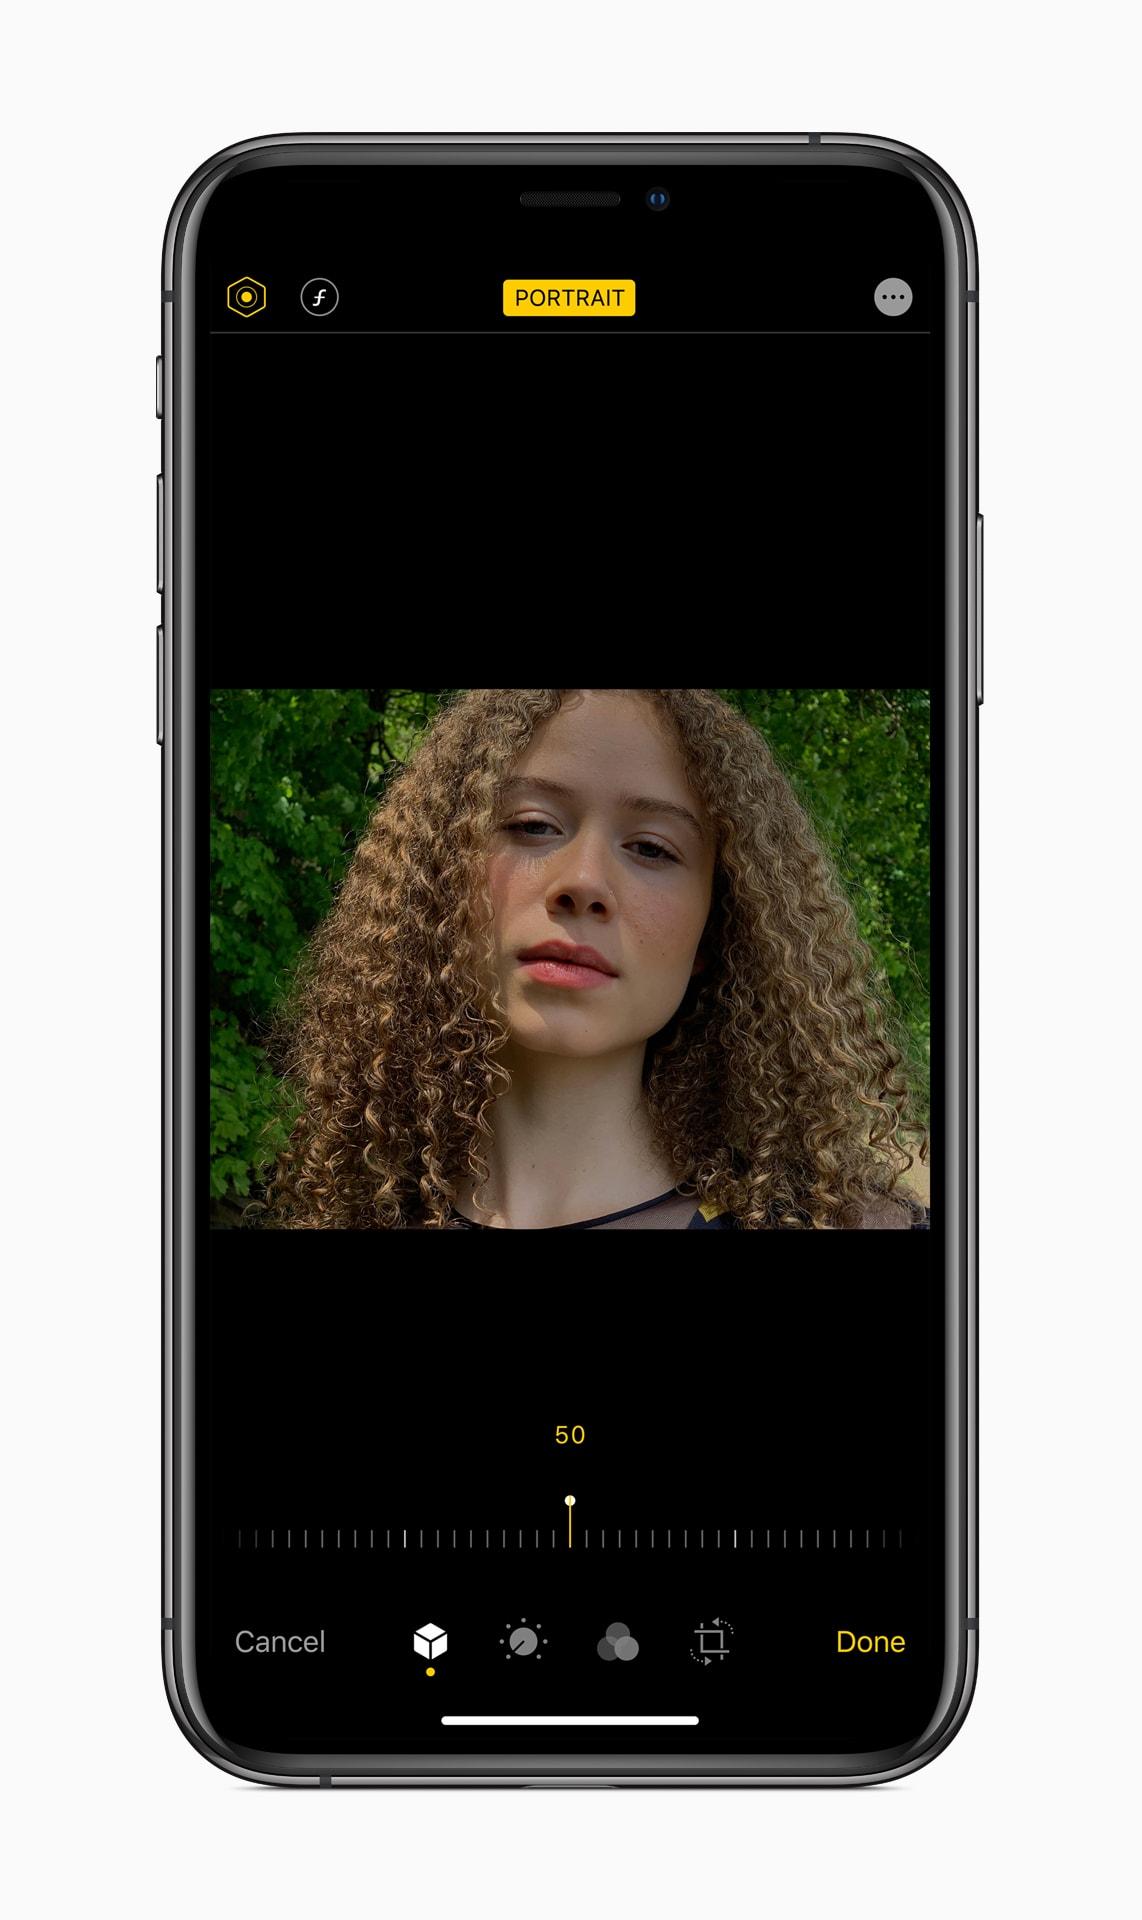 Cmera app on iOS 13